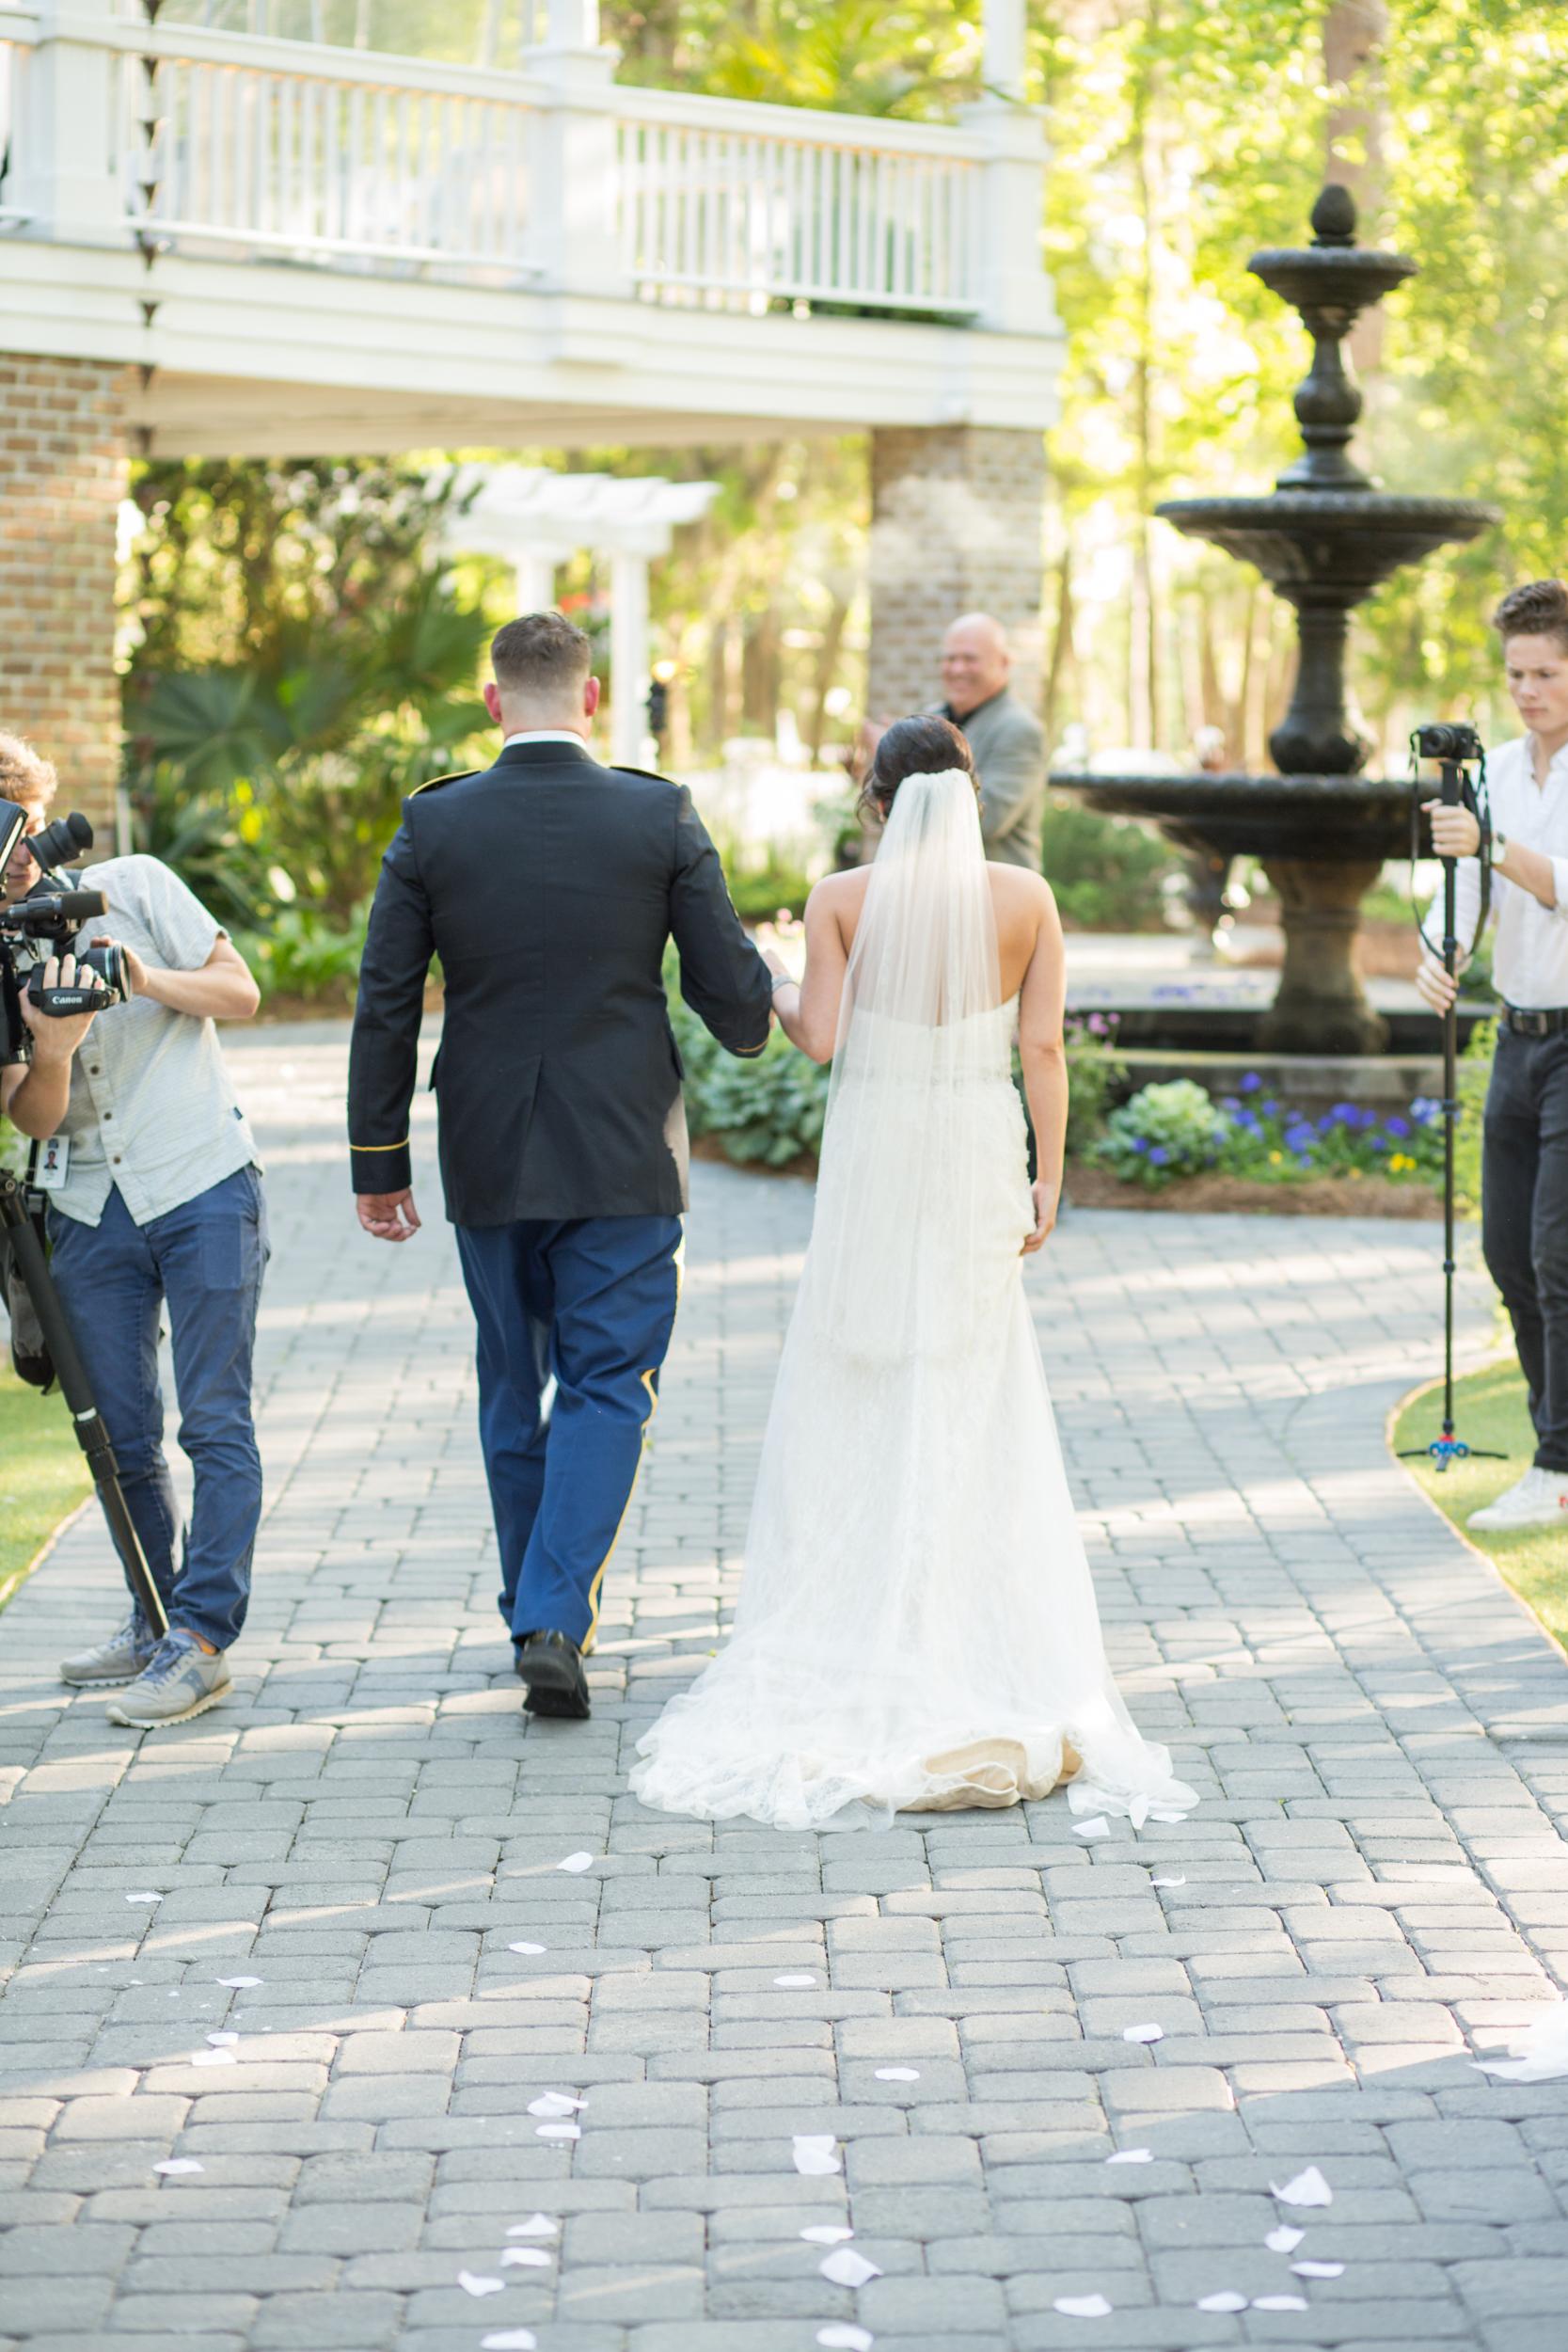 Outdoor wedding ceremony at The Mackey House in Savannah GA